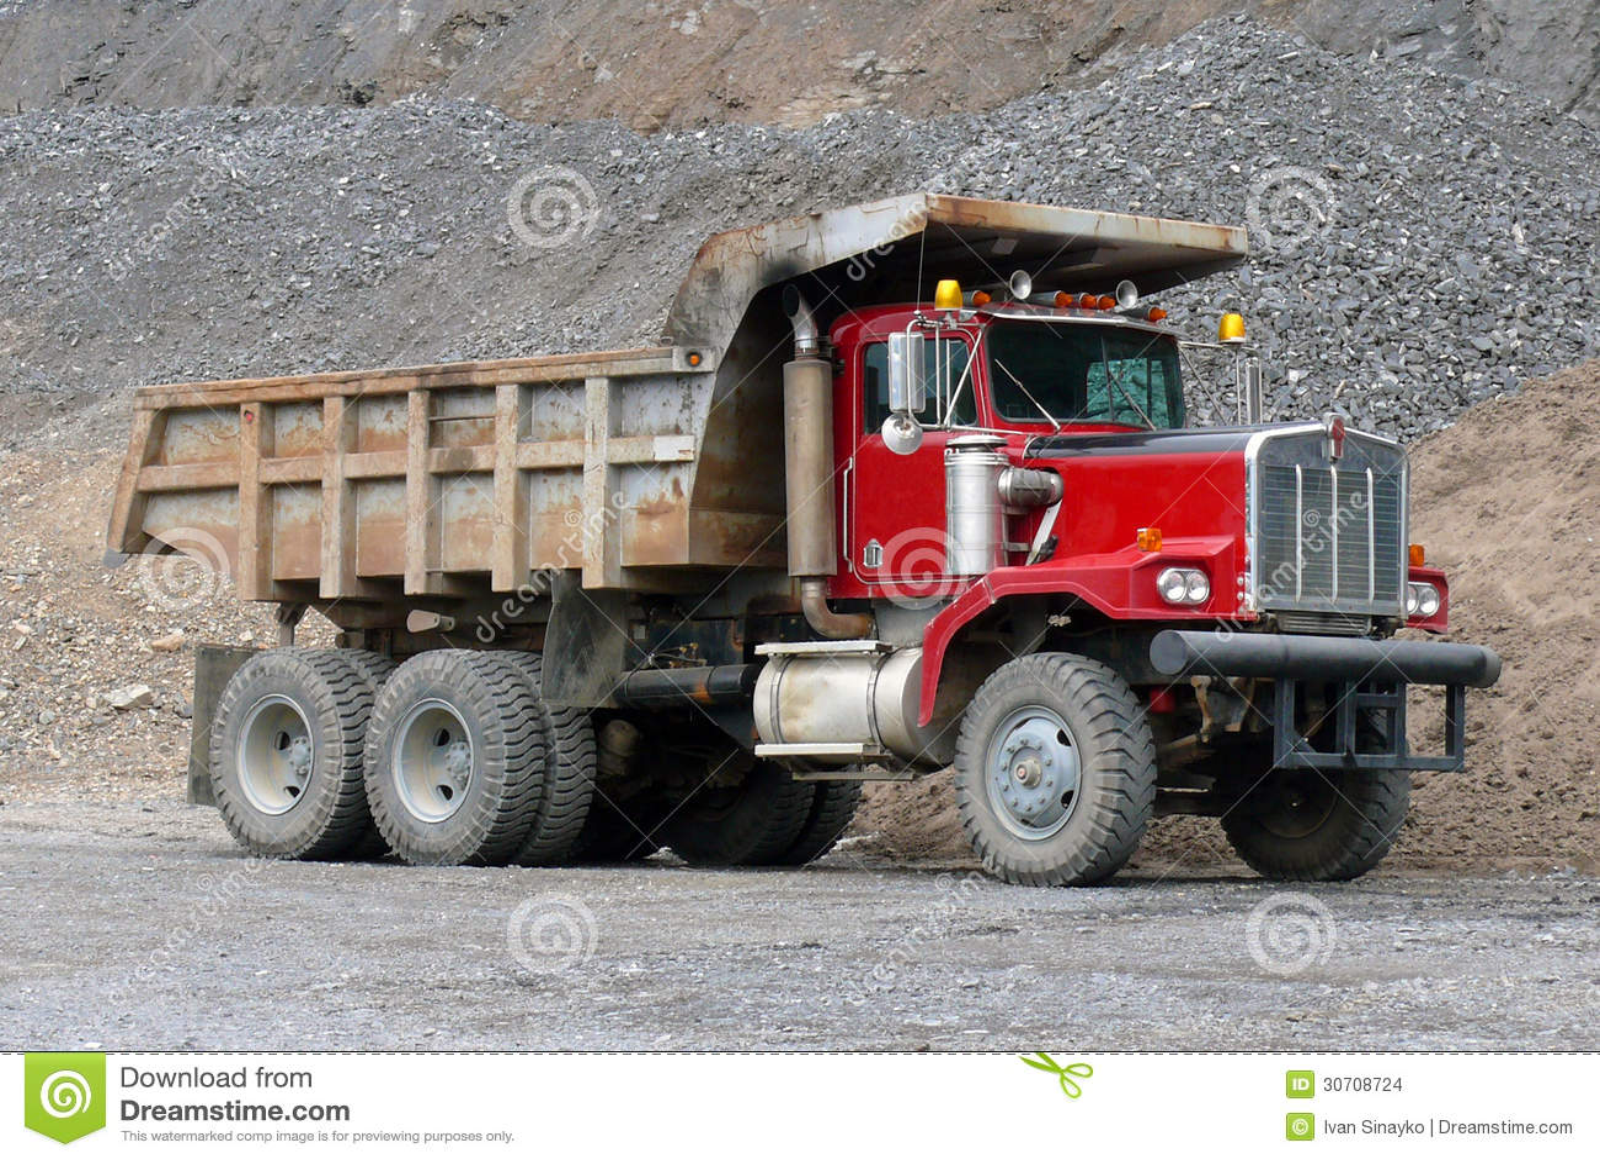 Porady ciężarówka